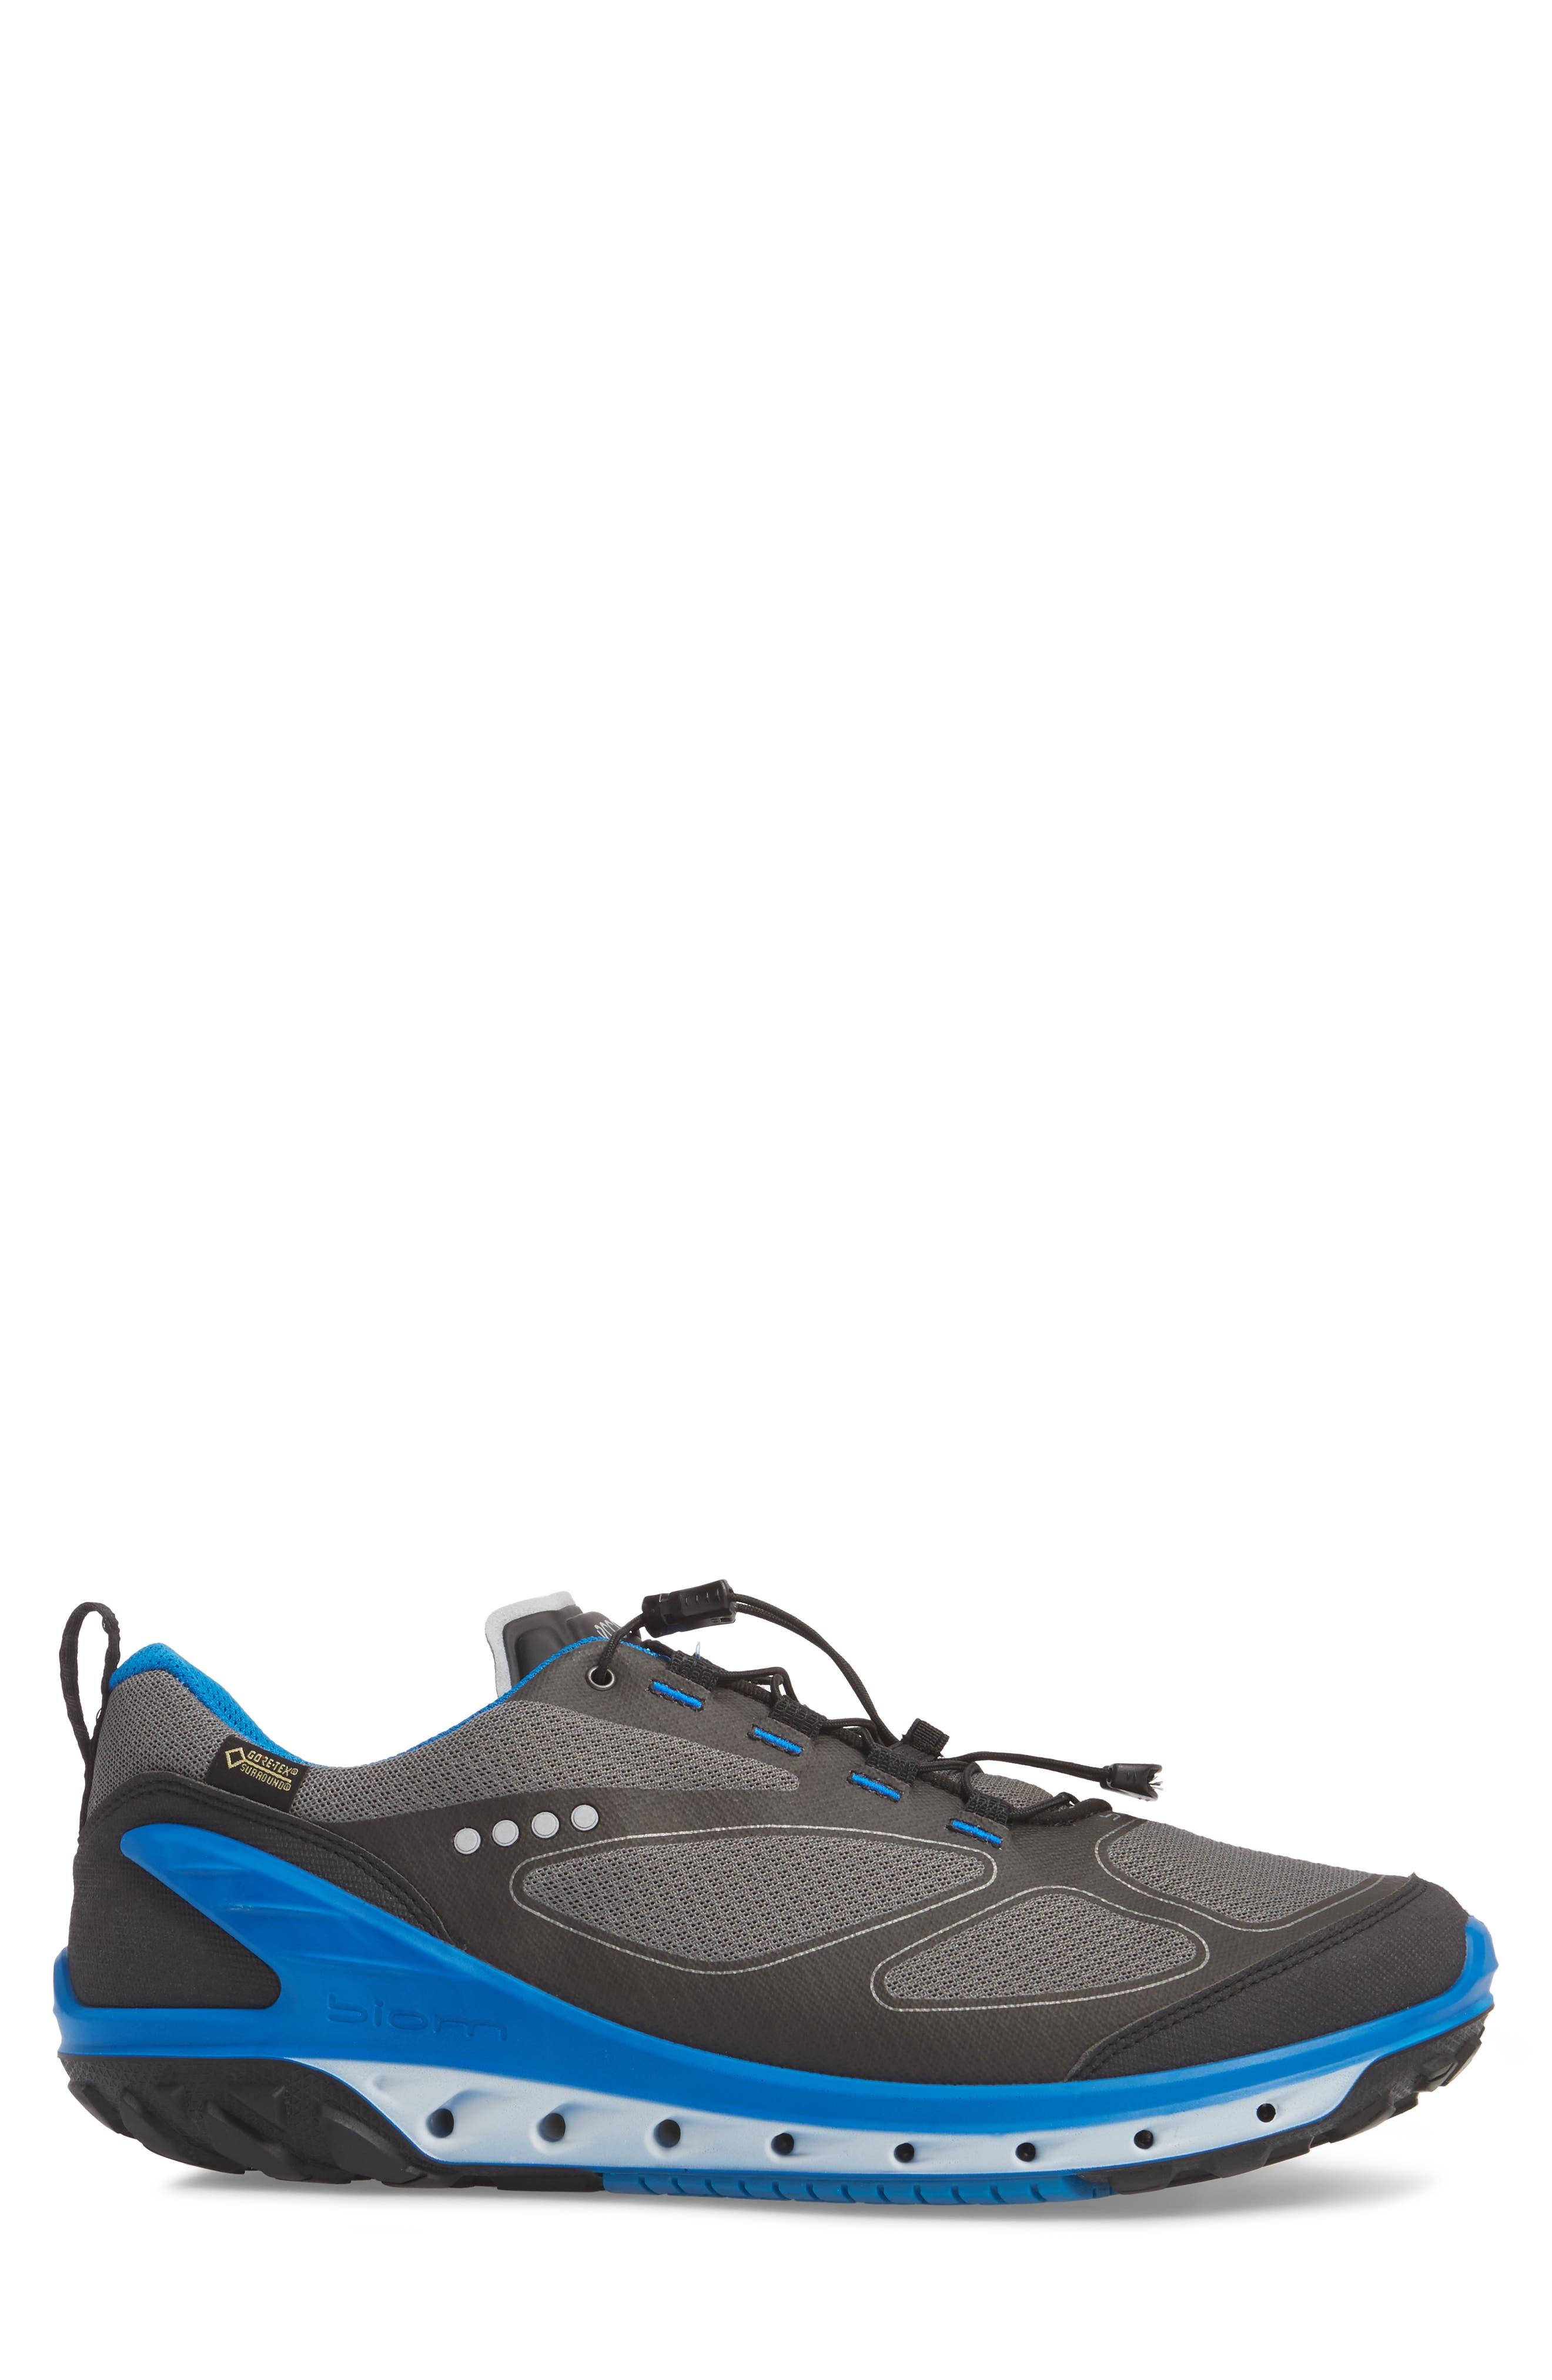 BIOM Venture GTX Sneaker,                             Alternate thumbnail 3, color,                             062